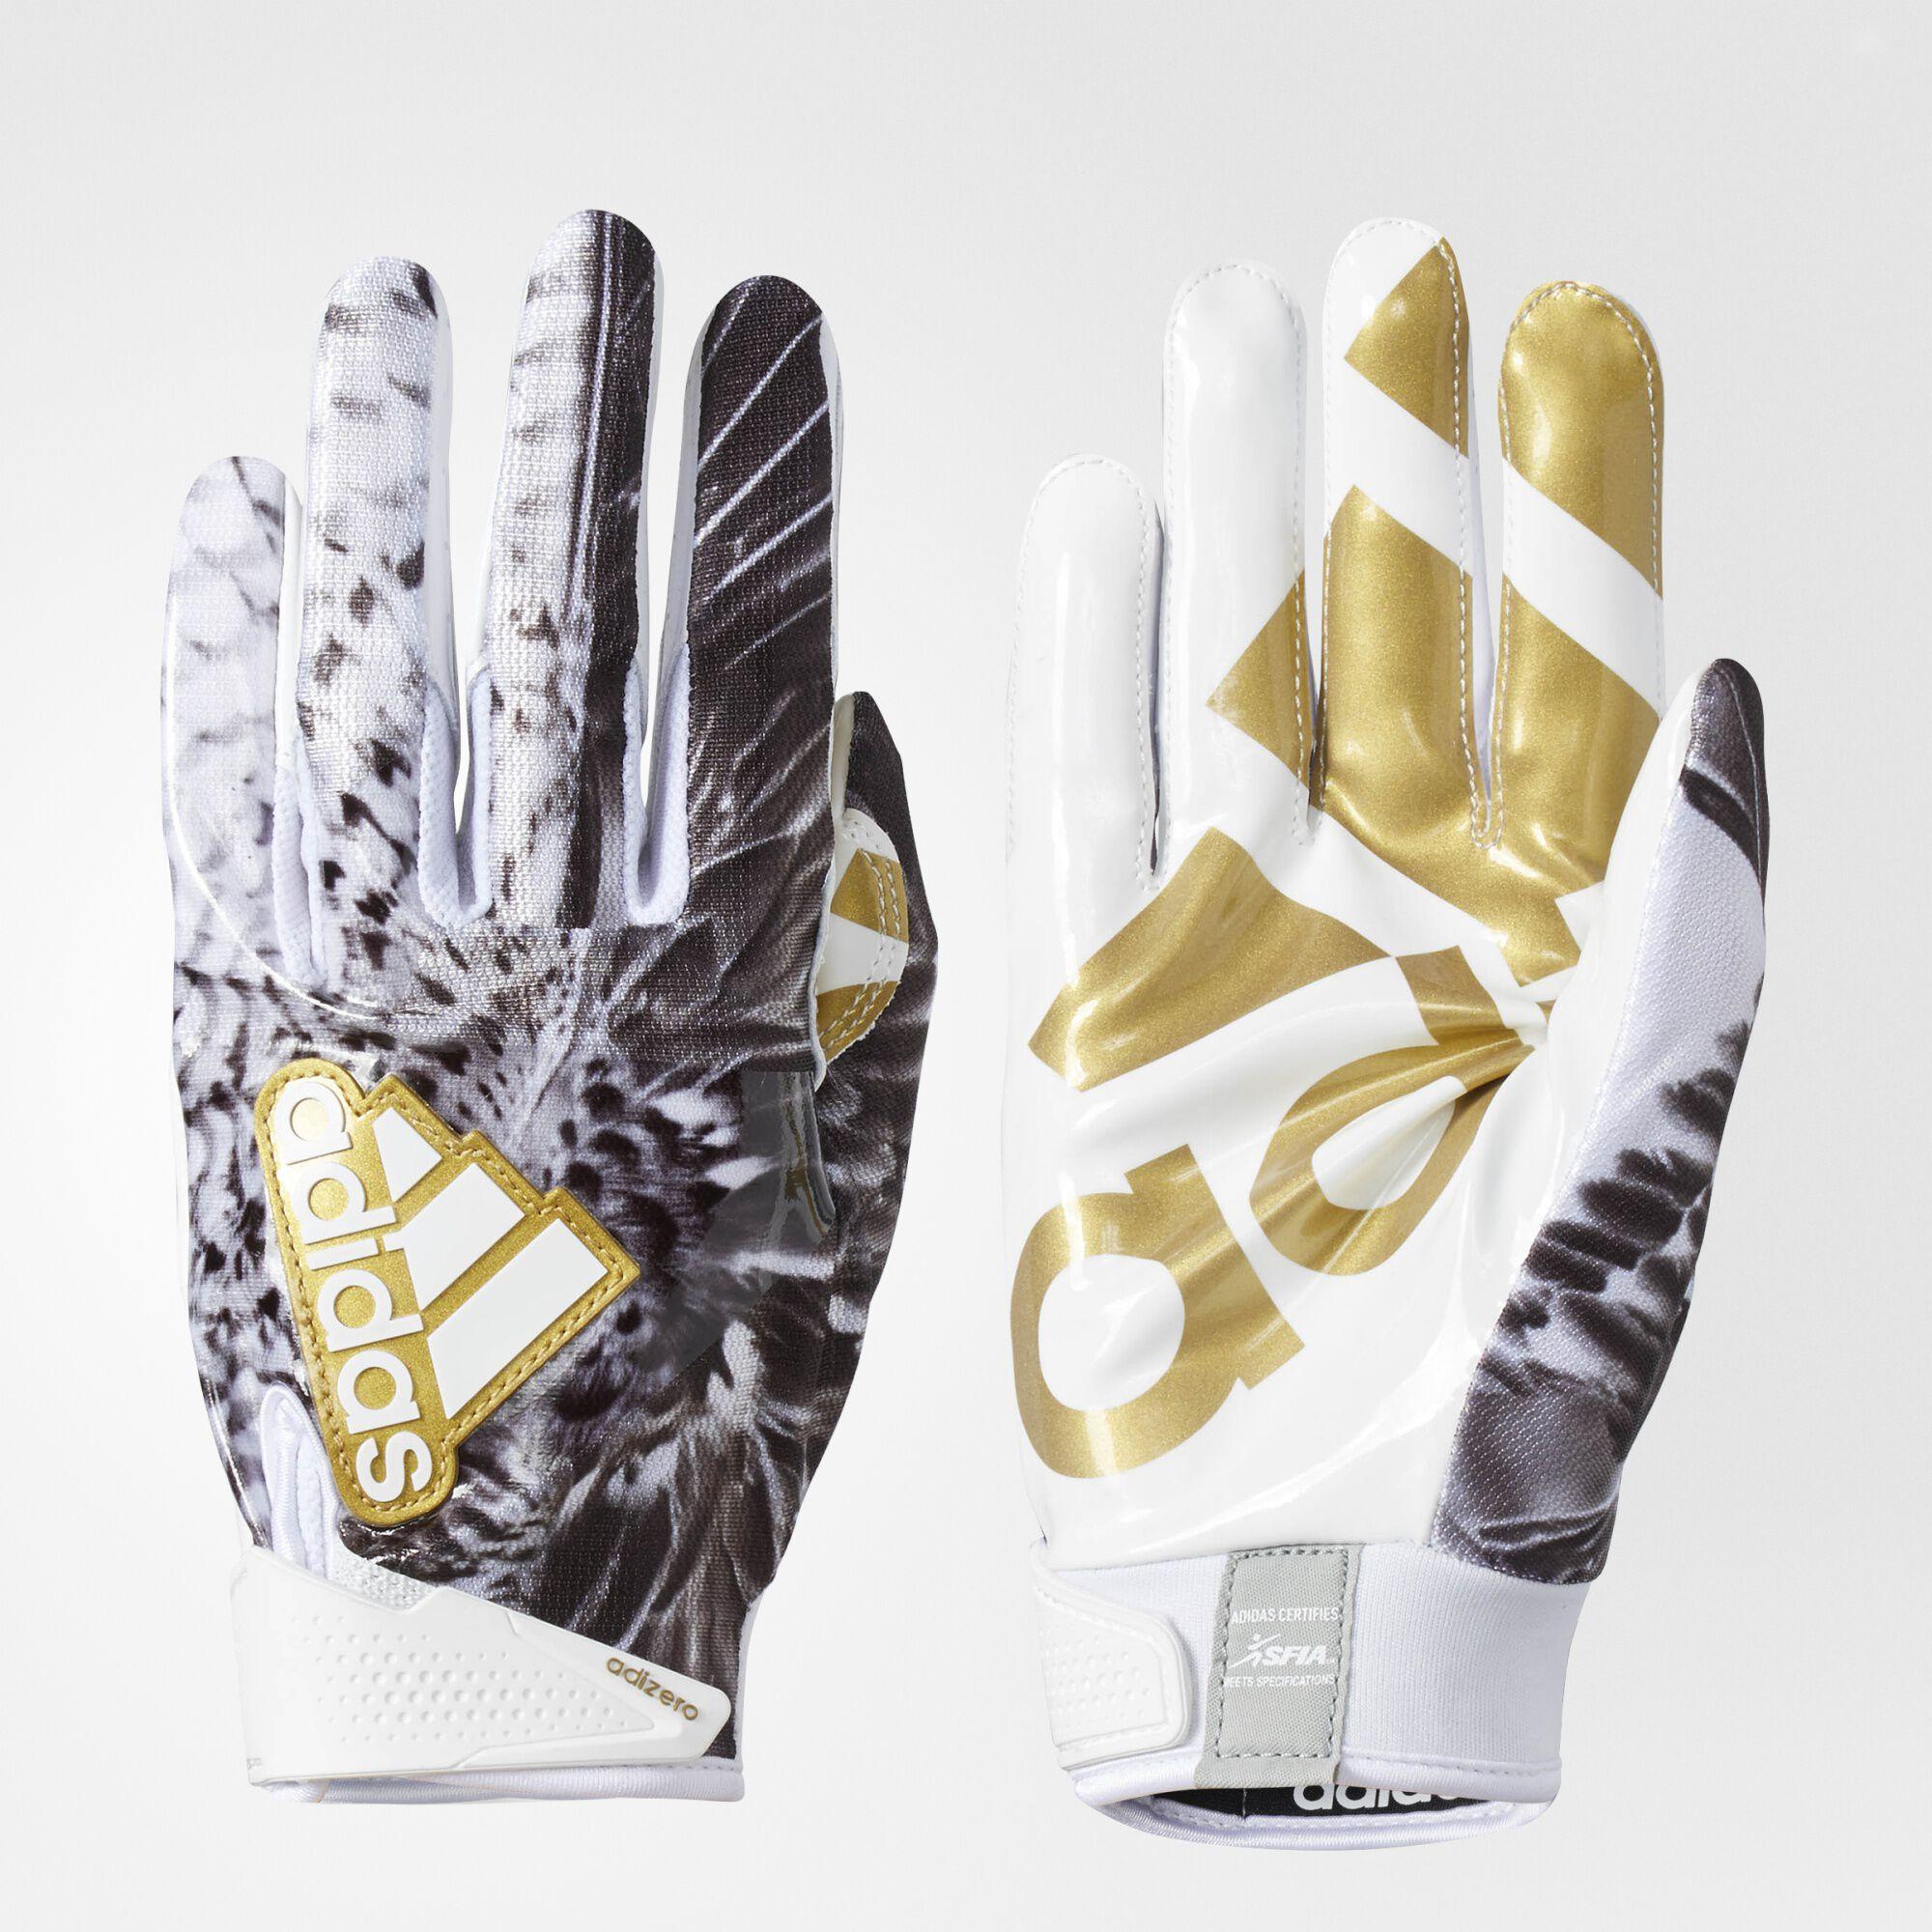 Mens gloves old navy - Adidas Adizero Five Star 5 0 Uncaged Gloves Multicolor Ci4593